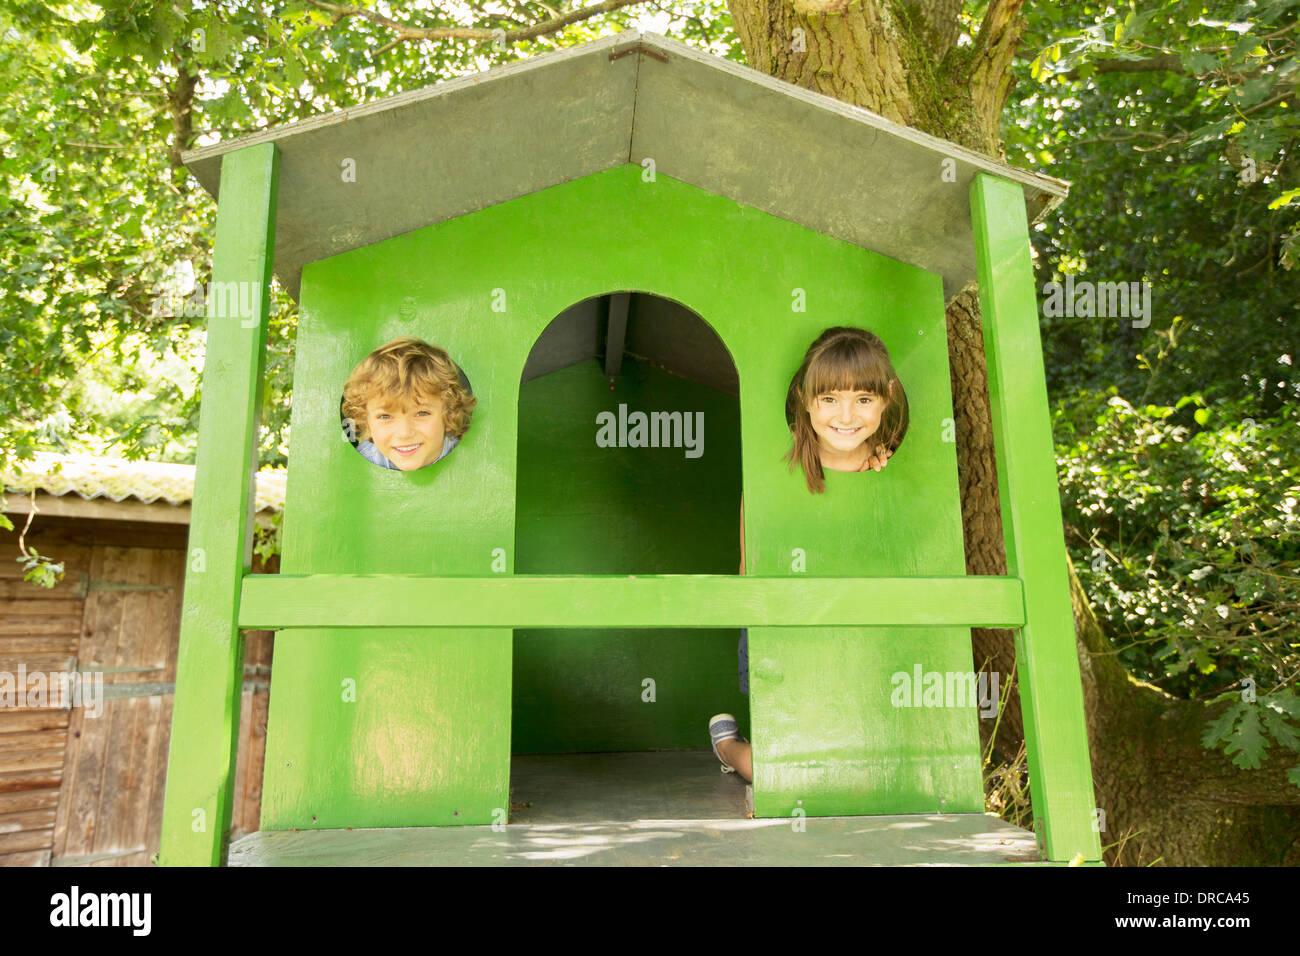 Children peeking through windows of treehouse - Stock Image